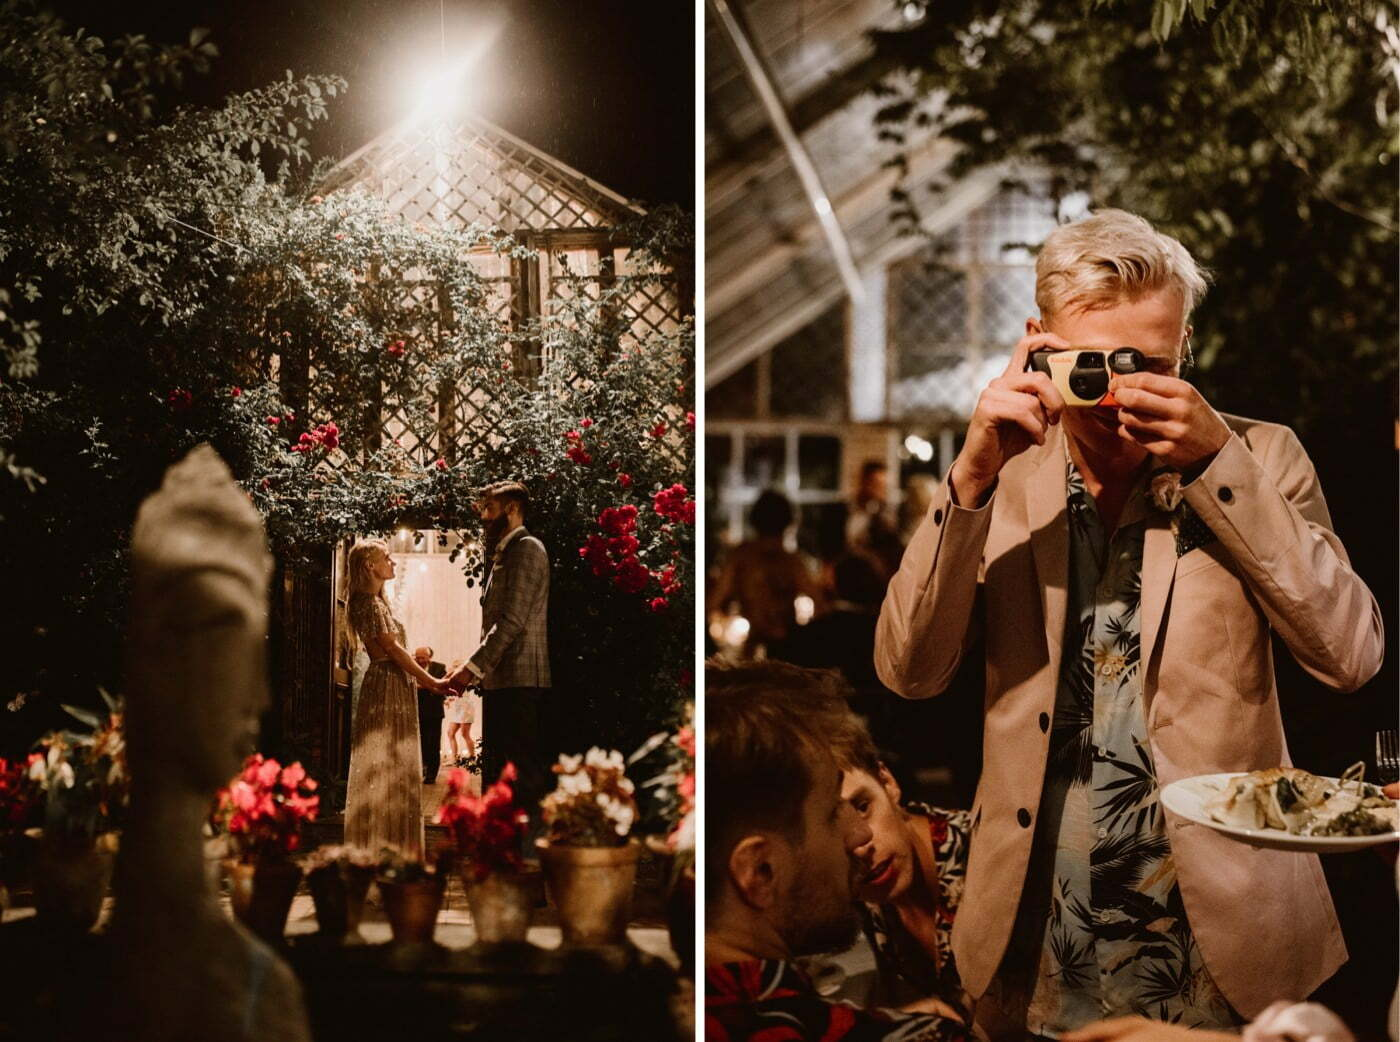 ewelina zieba rustykalne wesele stara oranzeria warszawa 079